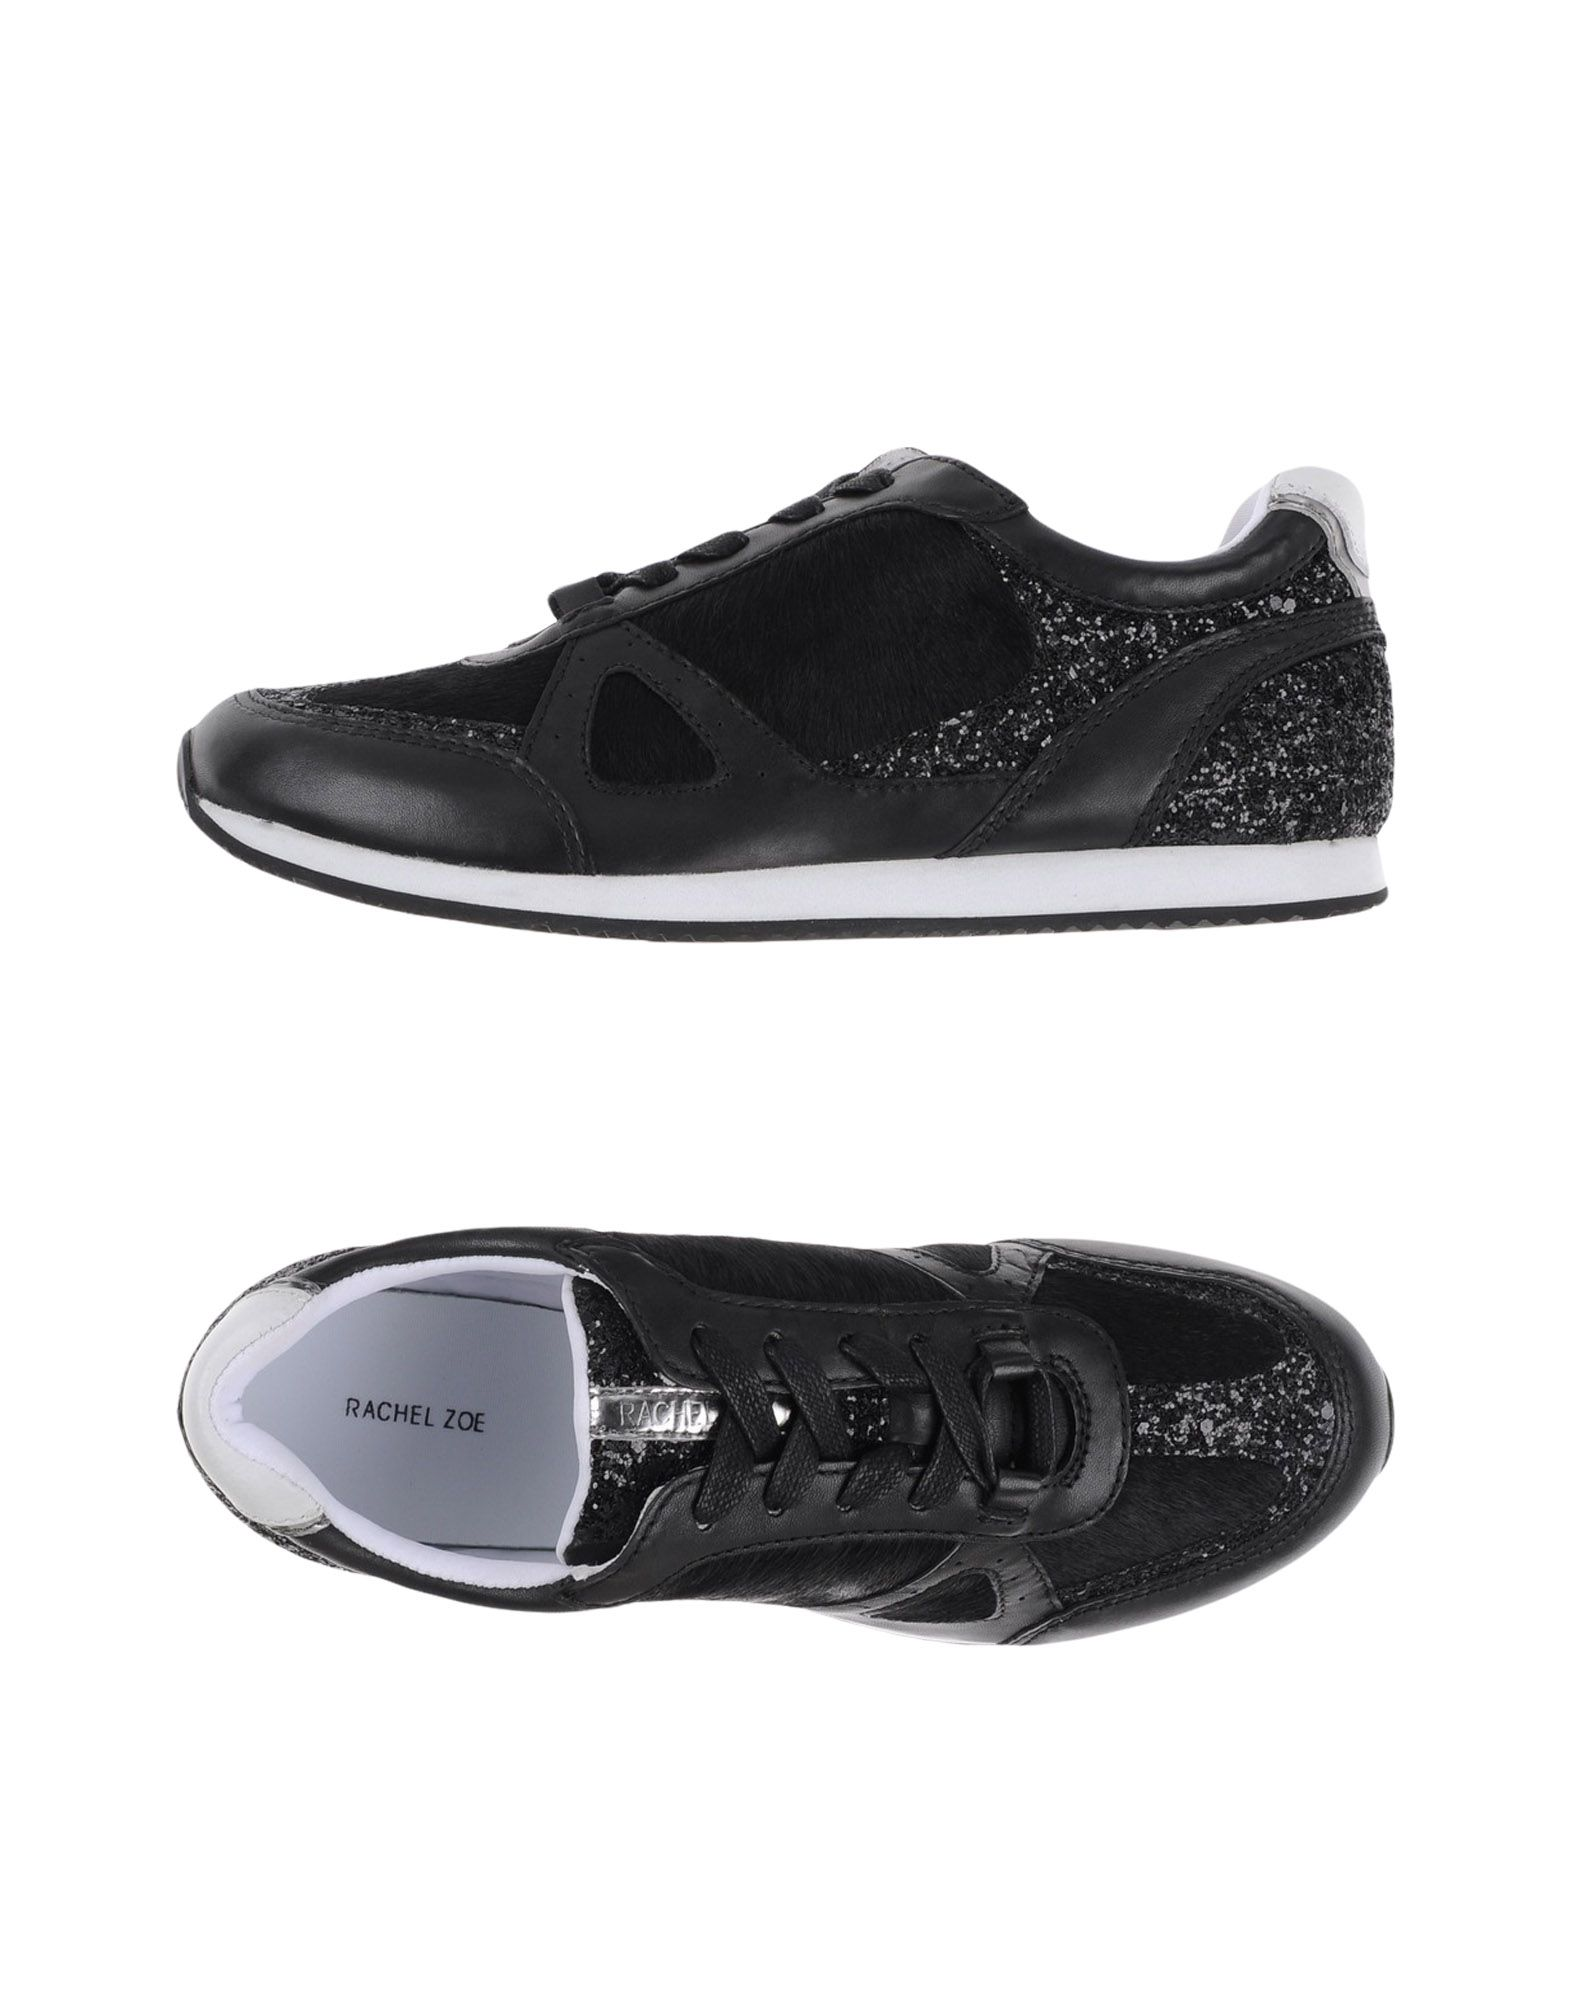 Rachel Zoe Sneakers Sneakers Zoe Damen  11112853XC Gute Qualität beliebte Schuhe a7233b